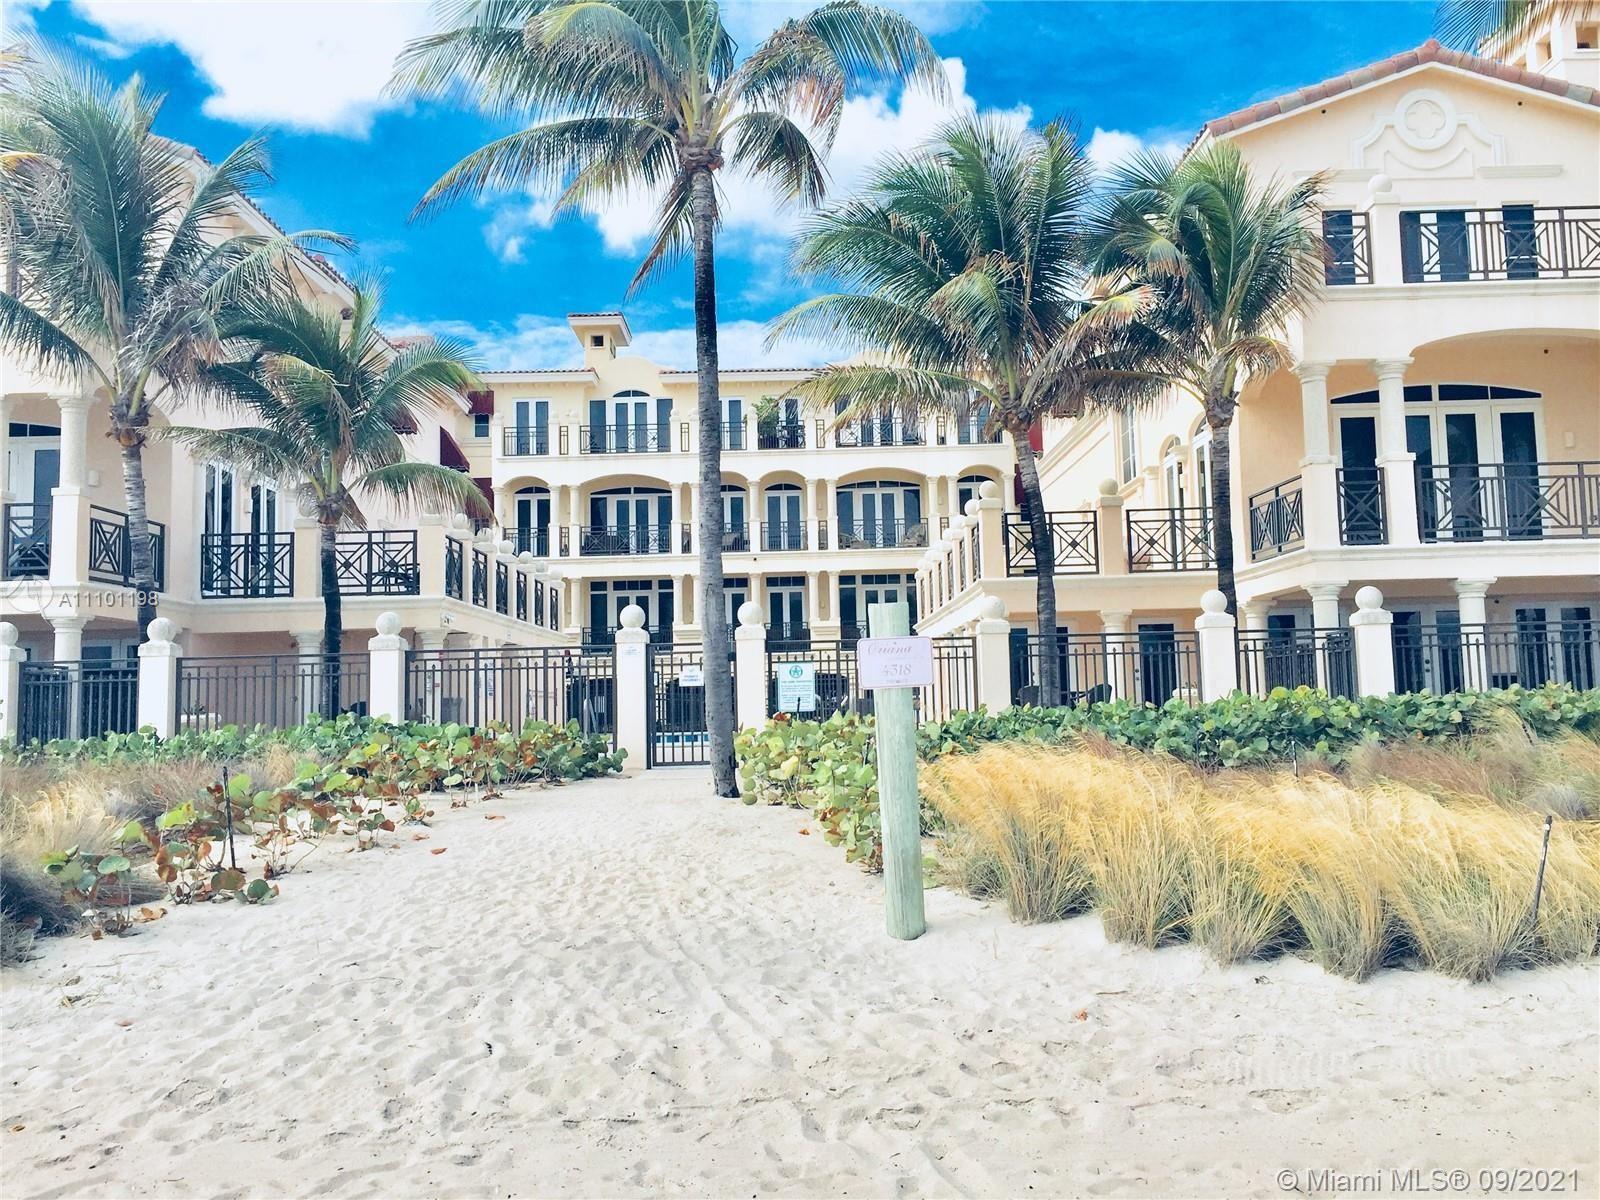 Photo of 4320 E El Mar Dr #201, Lauderdale By The Sea, FL 33308 (MLS # A11101198)